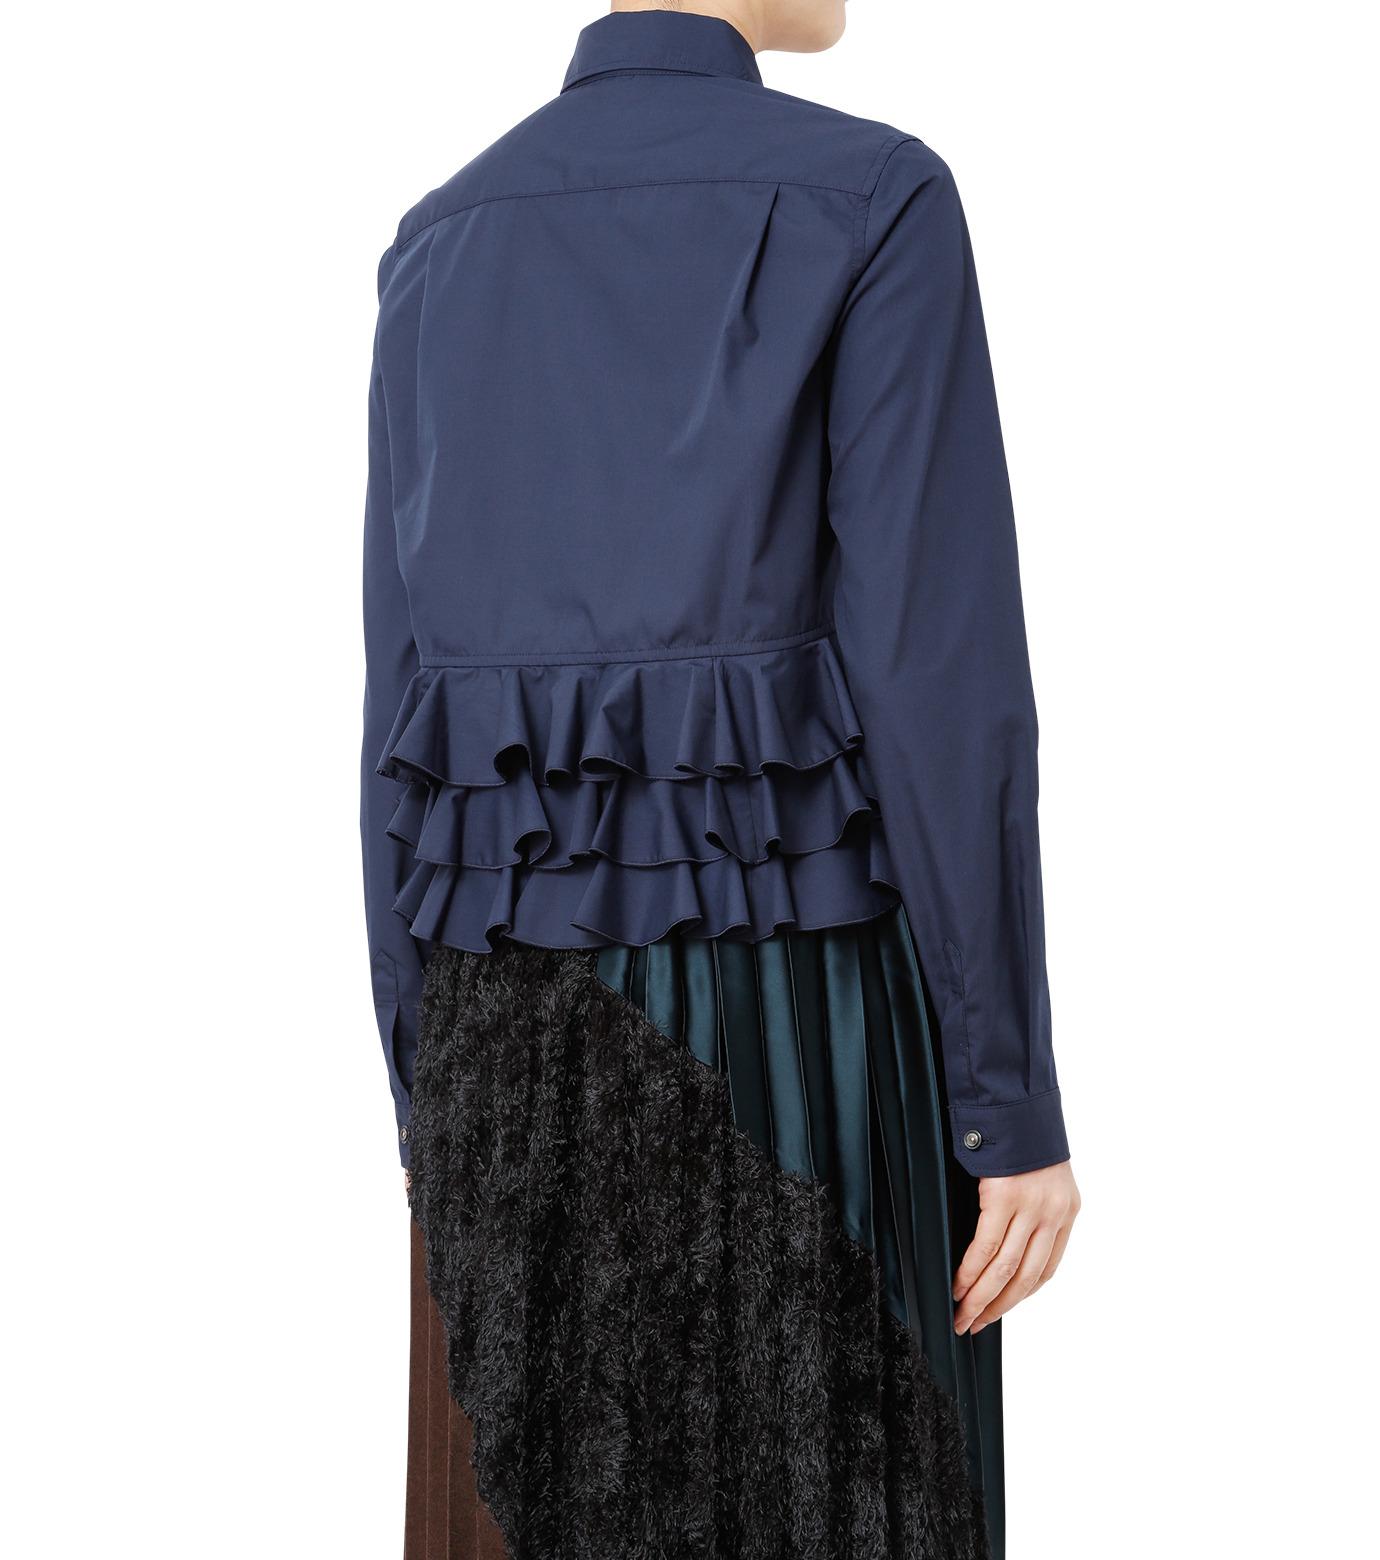 KOLOR(カラー)のShirt w/Back Ruffle Detail-NAVY(シャツ/shirt)-16WCL-B02134-93 拡大詳細画像2